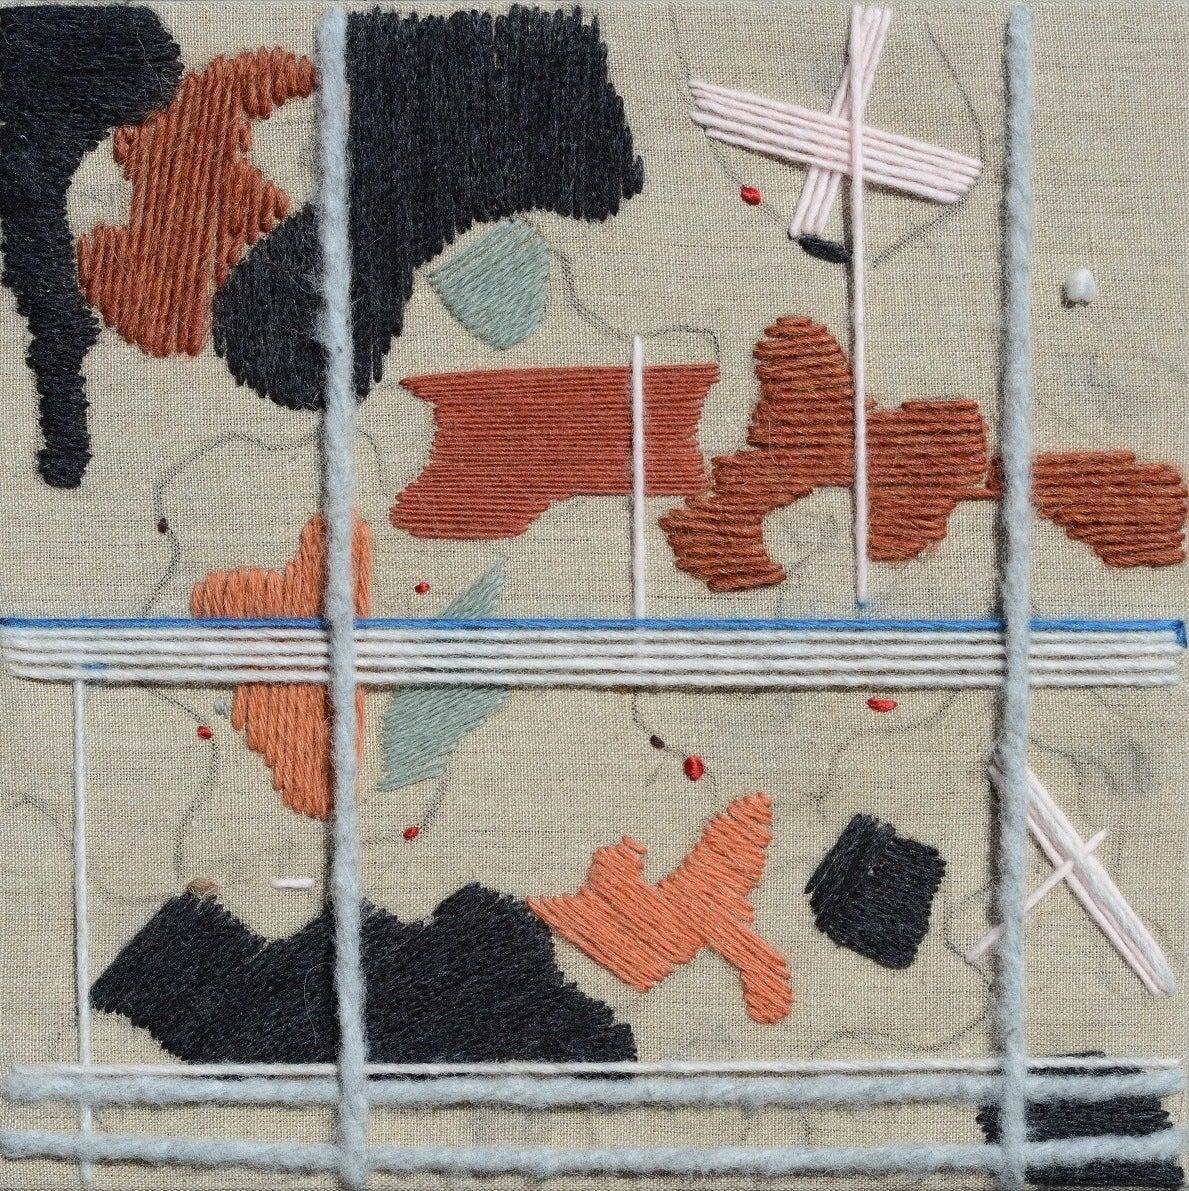 Tapestry 5 - Mixed Media Art by Matthew Varey